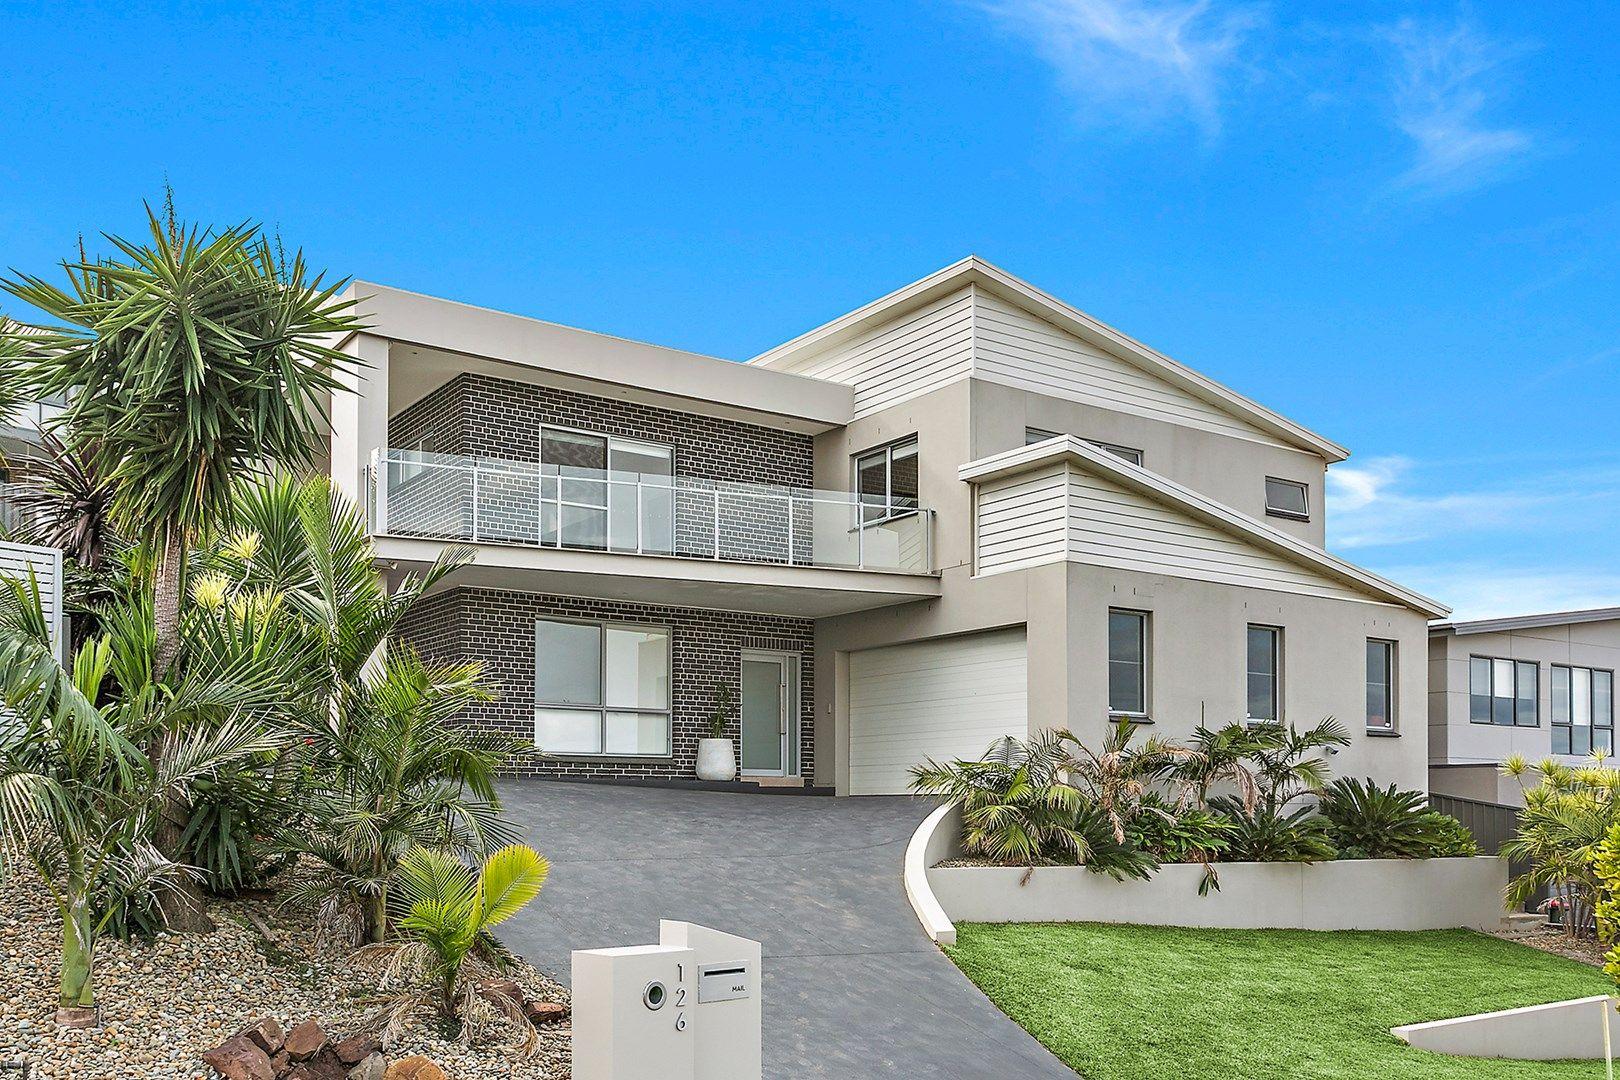 126 Whittaker Street, Flinders NSW 2529, Image 0